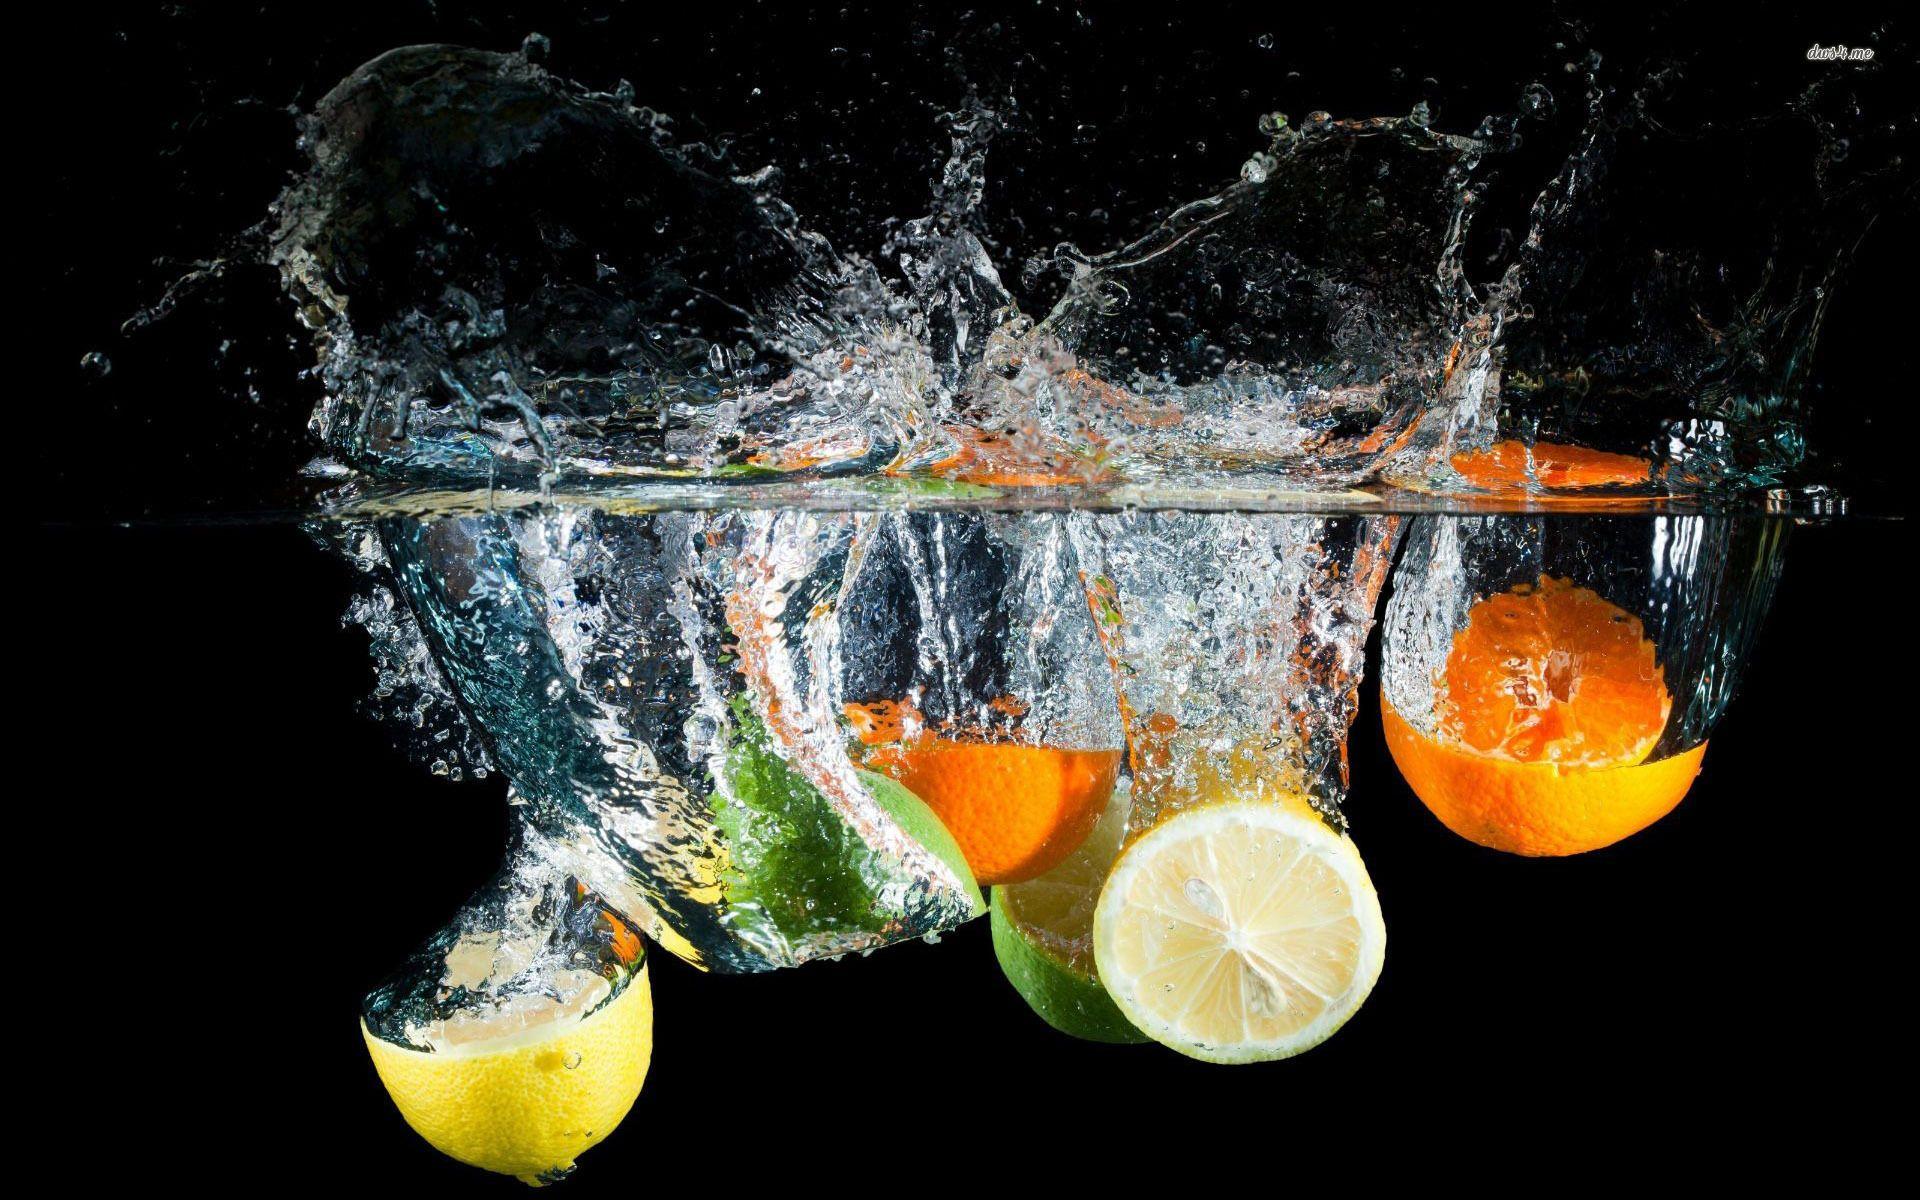 Colorful Lemon Fruit Hd Wallpaper Free Download Splash Photography Citrus Water Fruit Photography